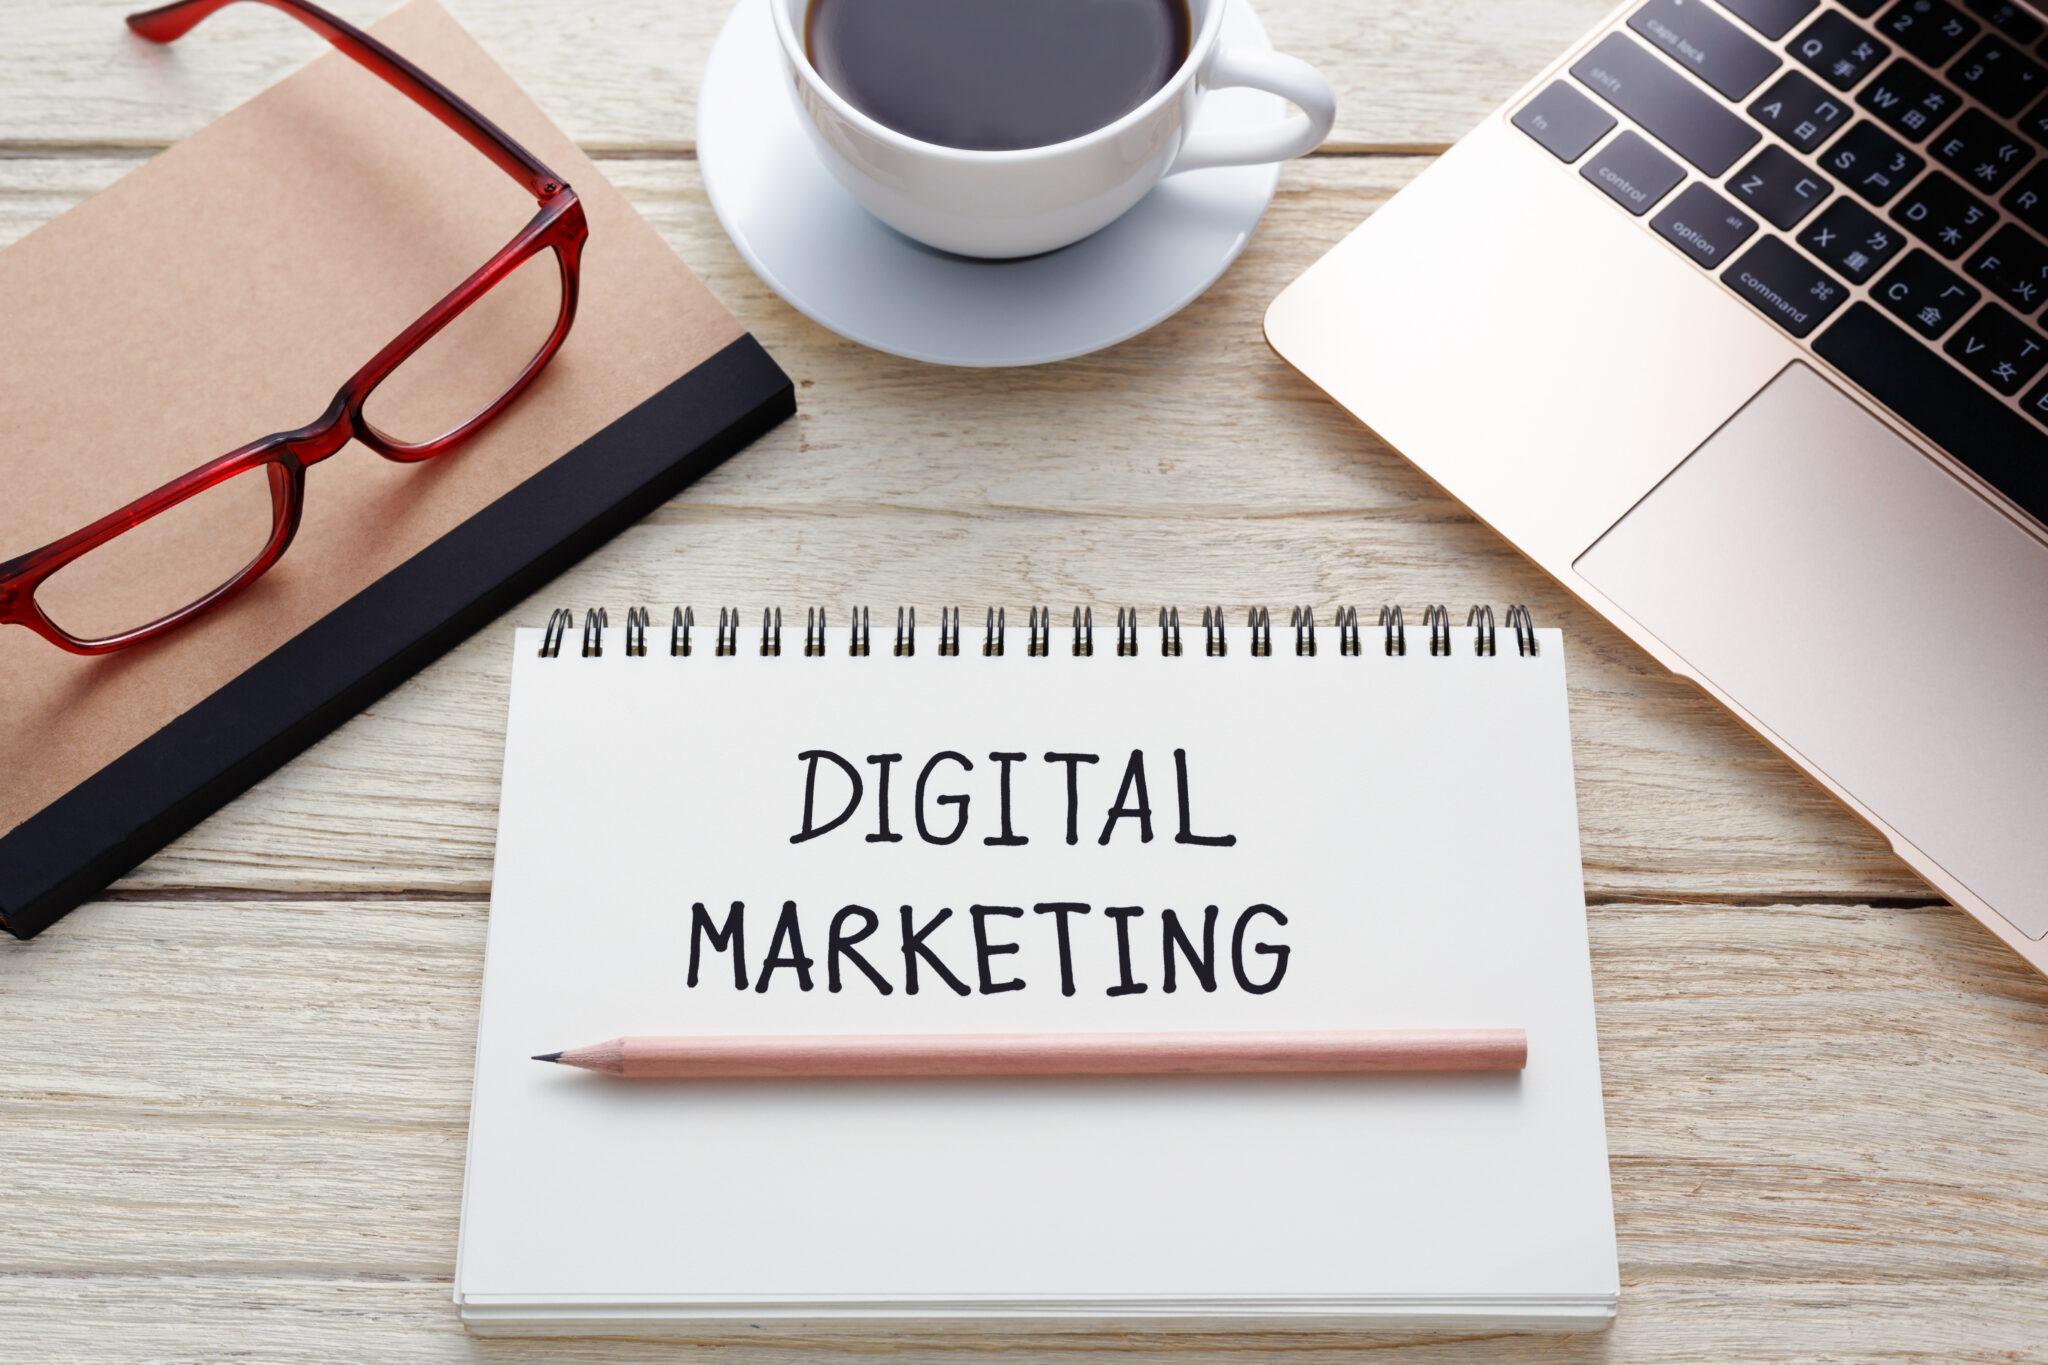 Understanding the Services Digital Marketing Provides